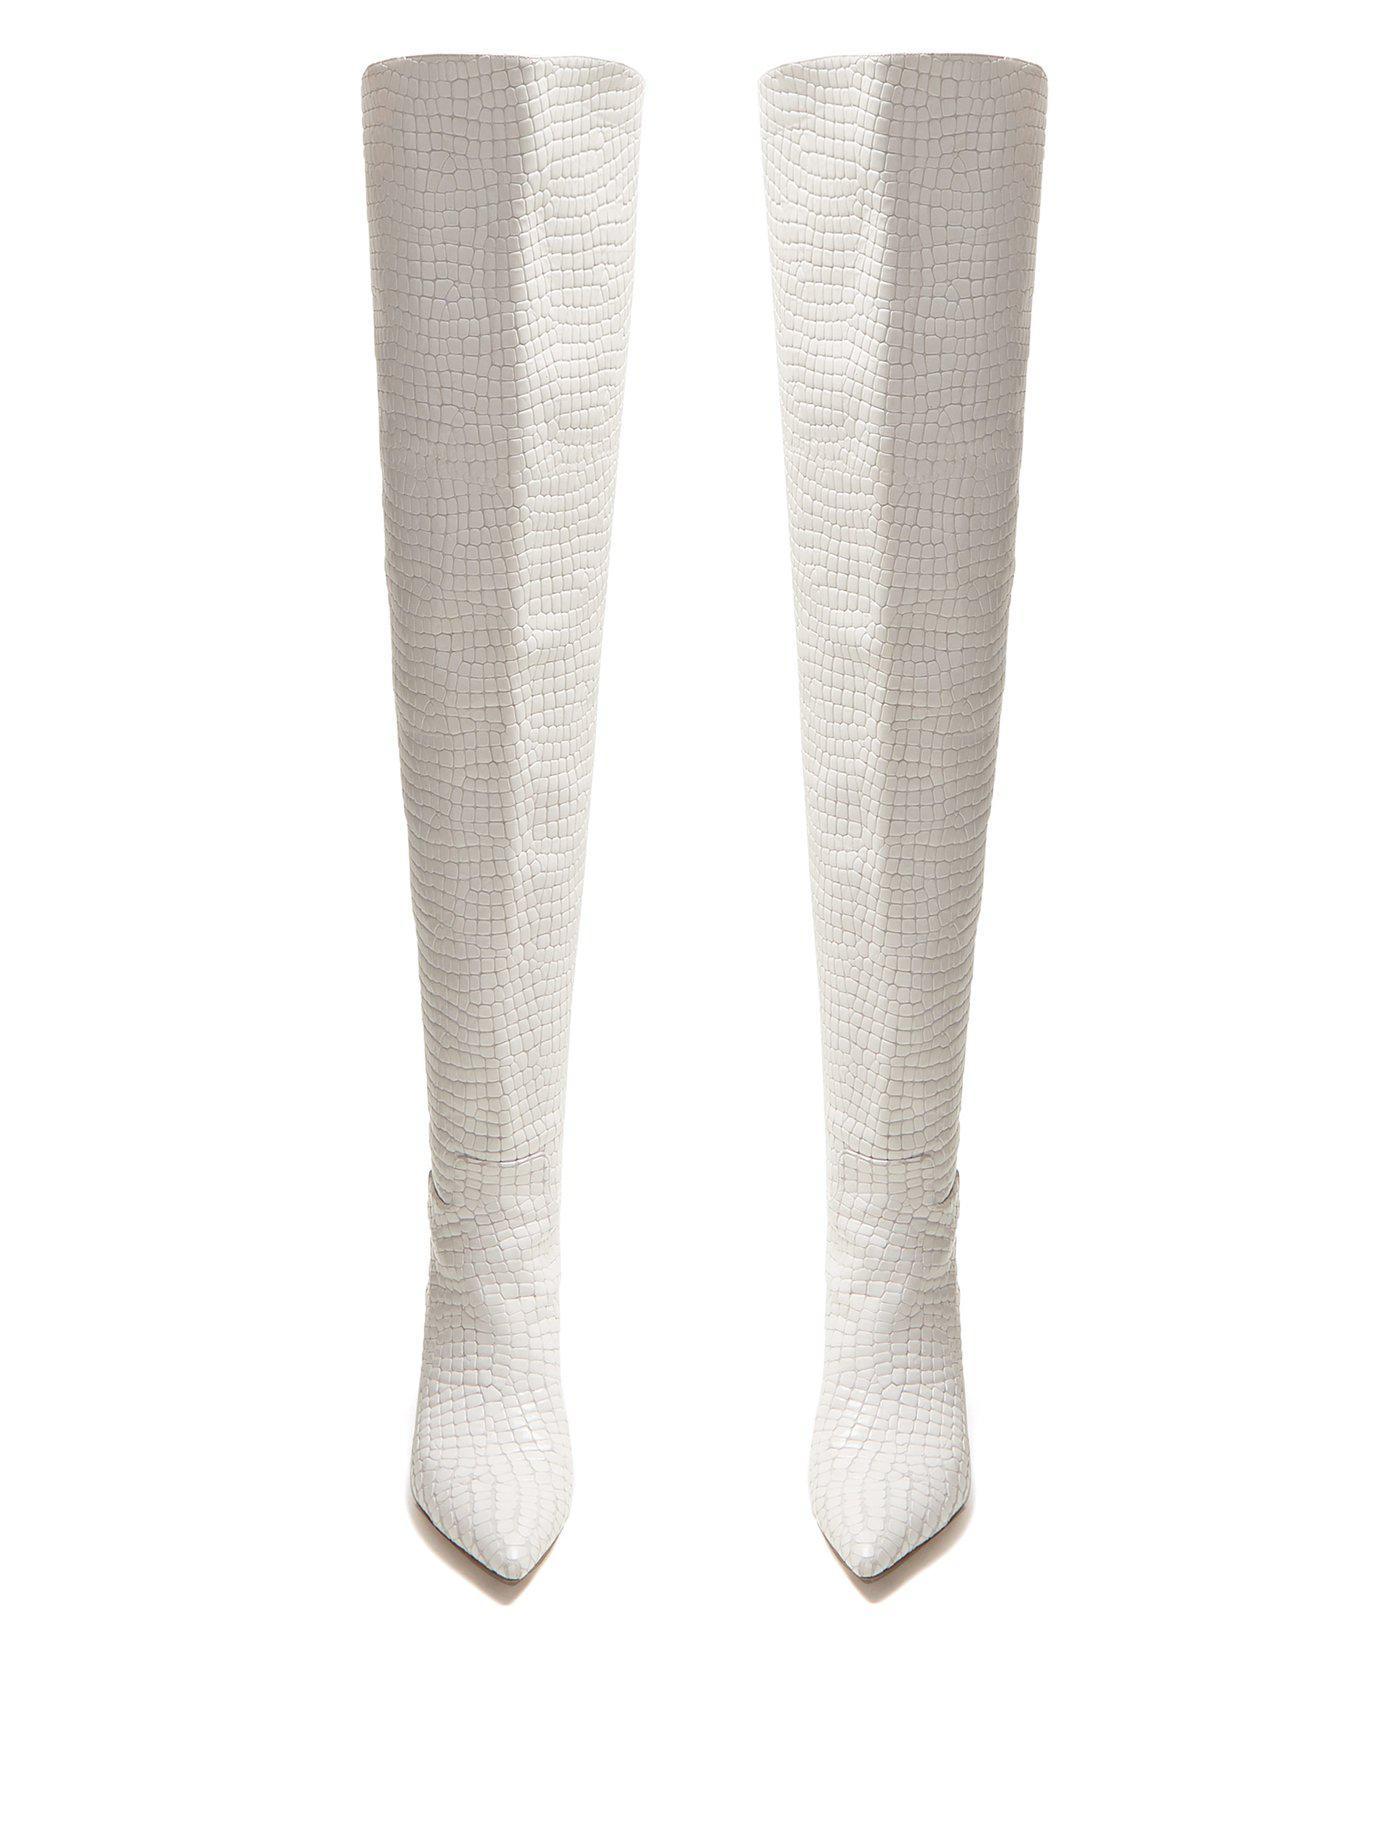 510564286e2 Lyst - Attico Crocodile Effect Leather Over The Knee Boots in White